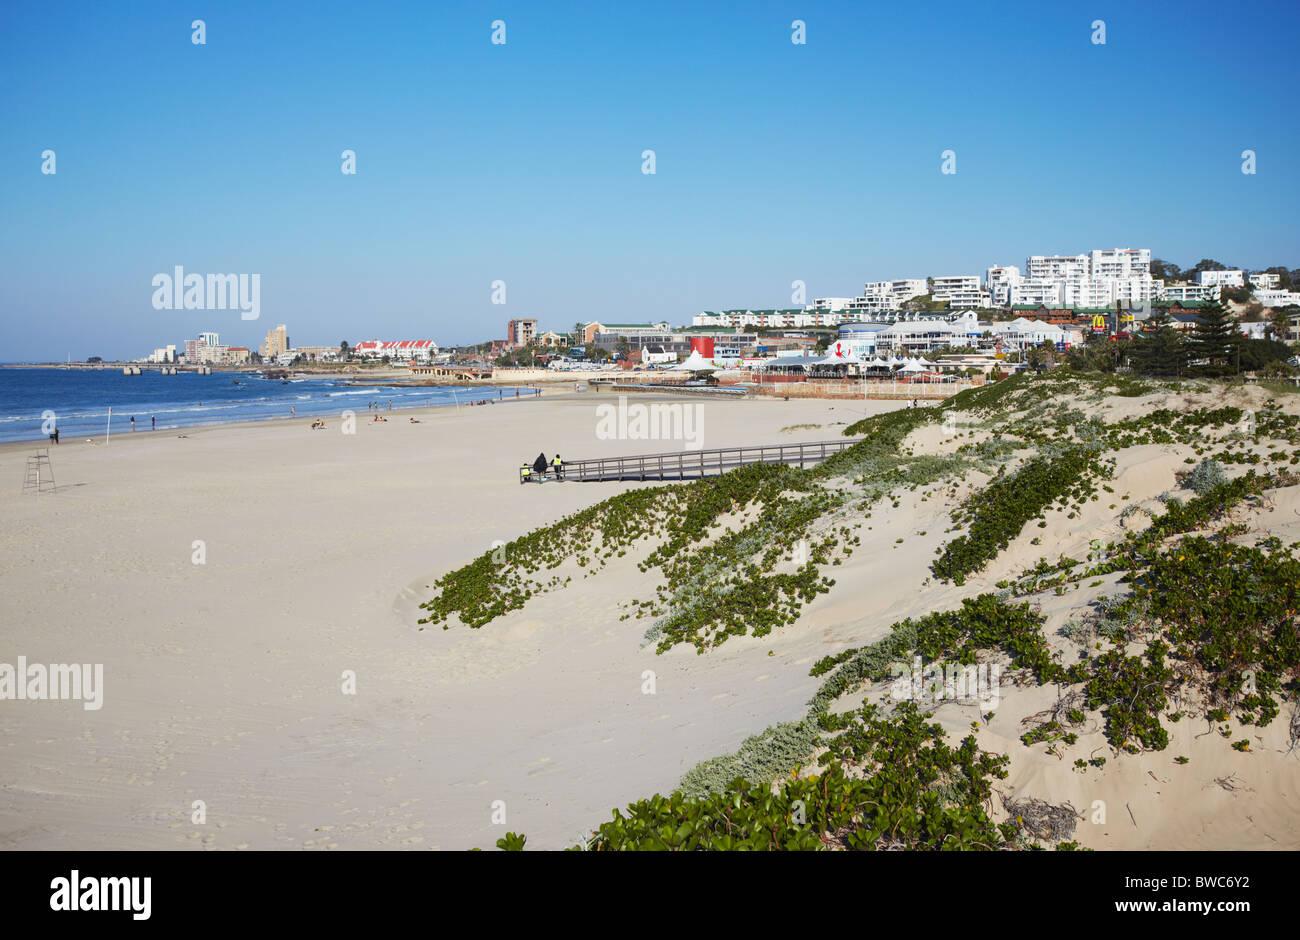 Kings beach humewood port elizabeth eastern cape south - Population of port elizabeth south africa ...